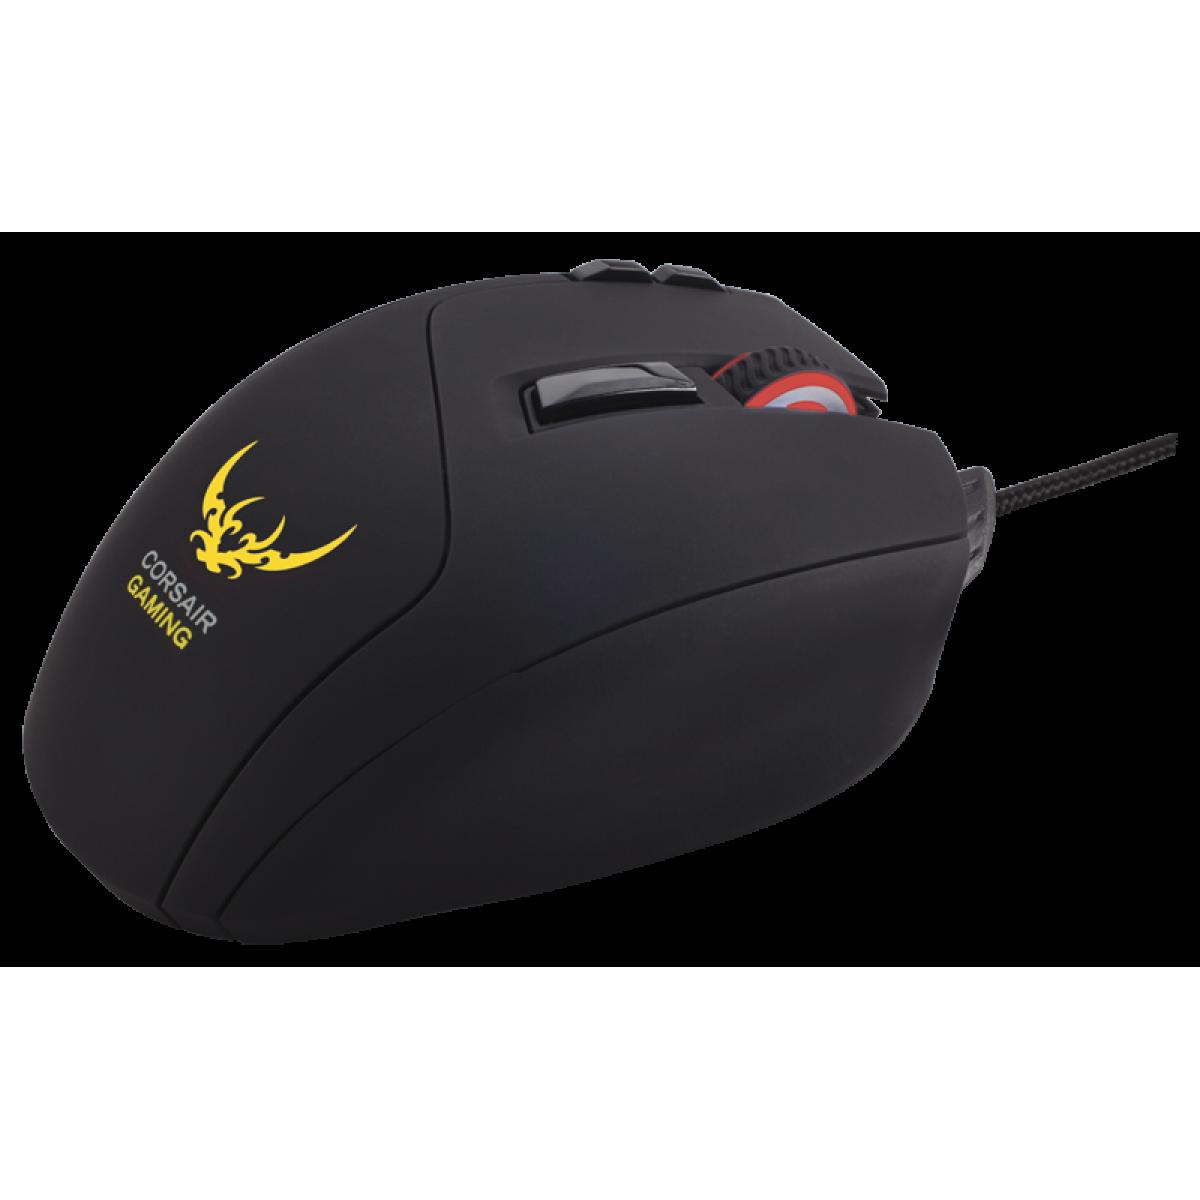 Mouse Corsair Gaming Sabre Óptico RGB CH-9000056-NA 6400DPI - USB